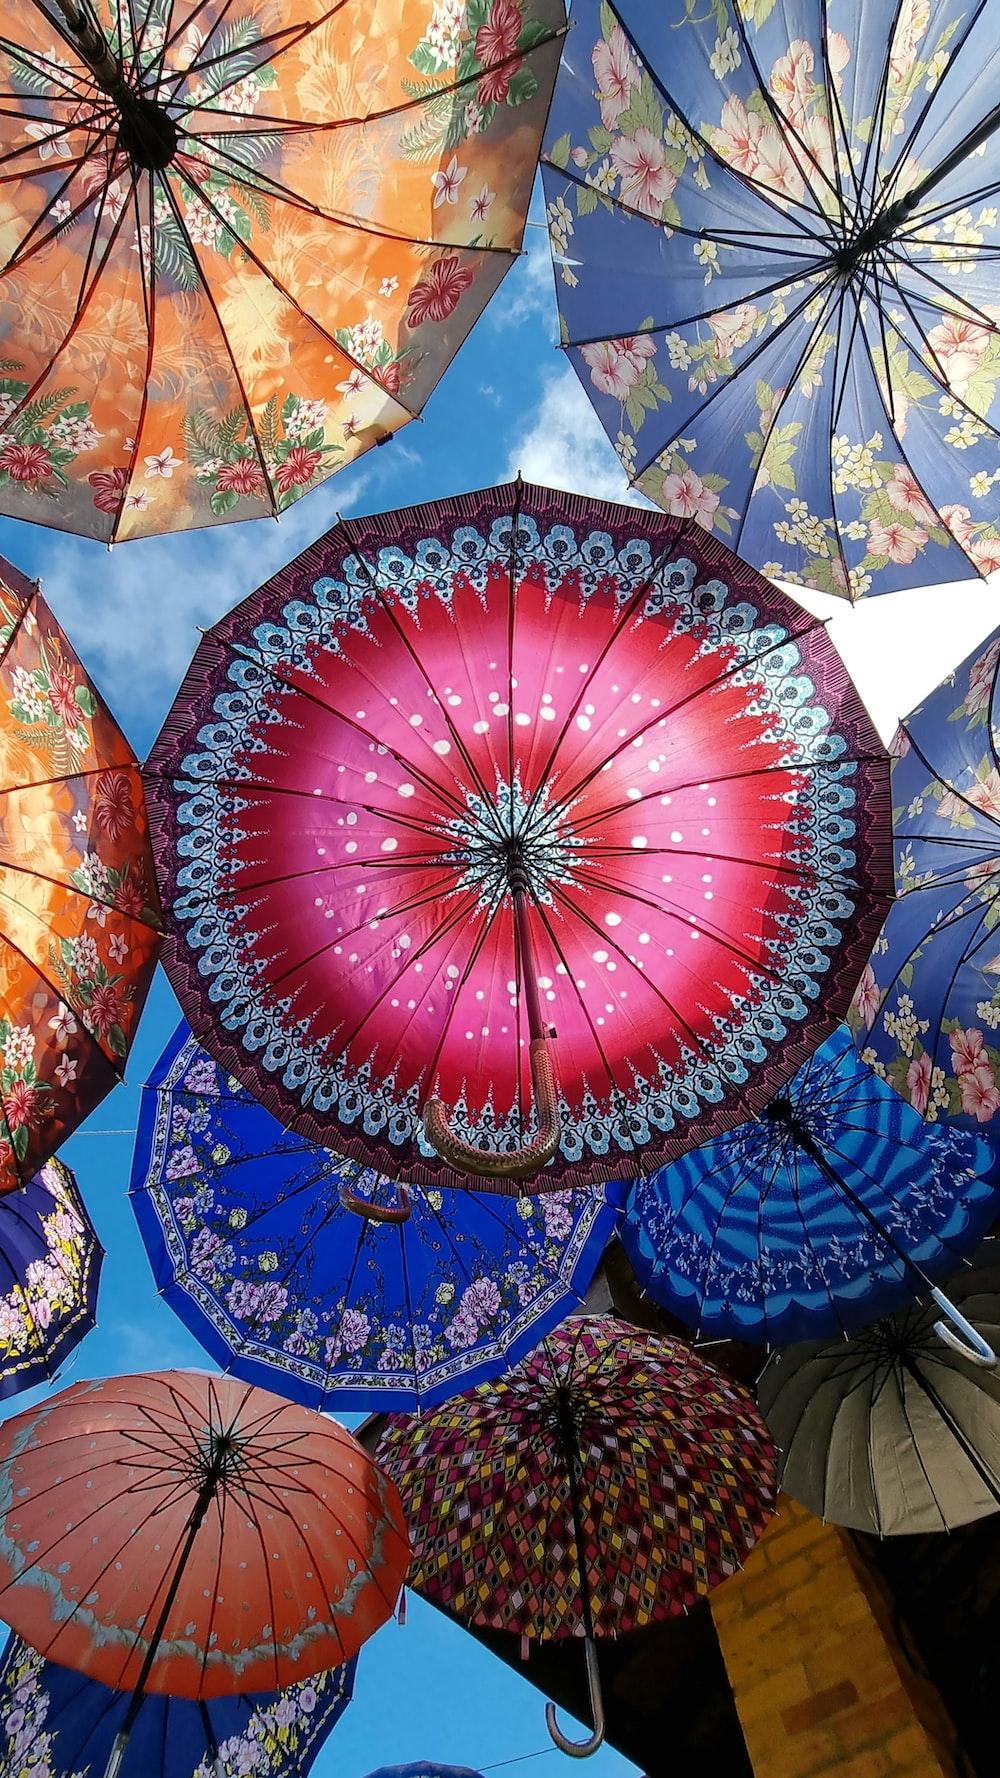 red and blue umbrella umbrella under blue sky